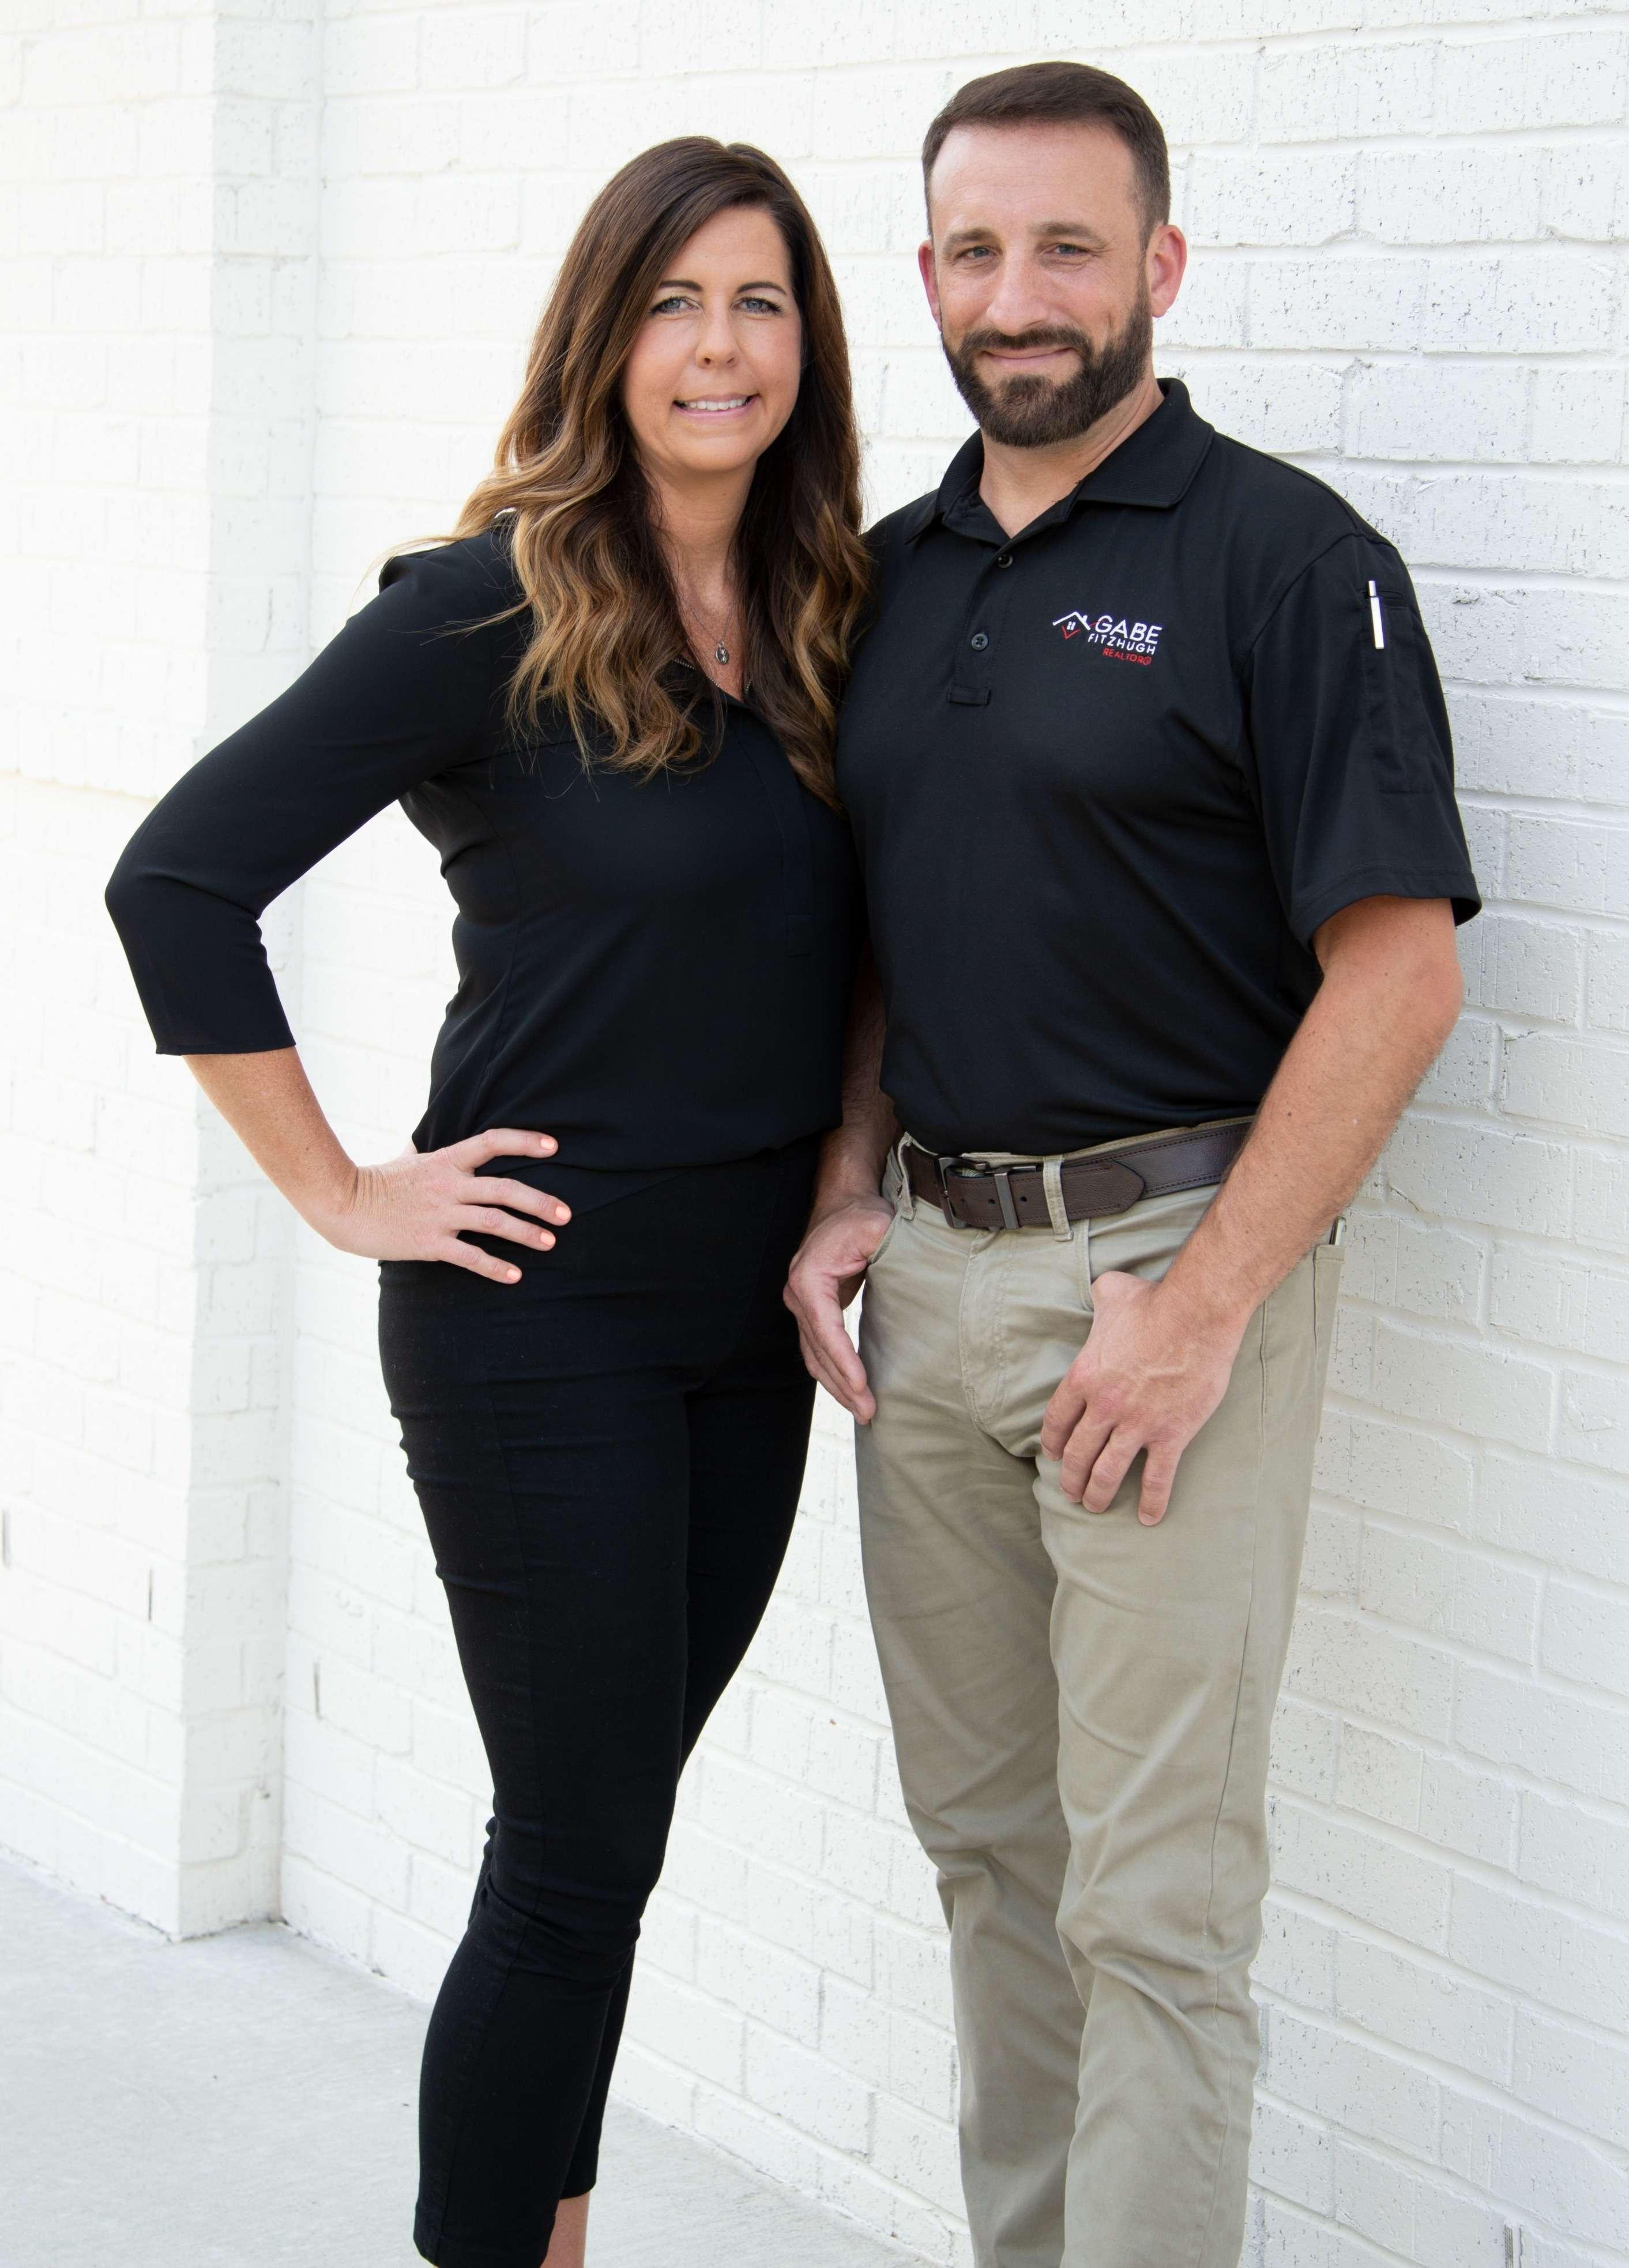 Gabe and Katey Fitzhugh, the Fitzhugh real estate team